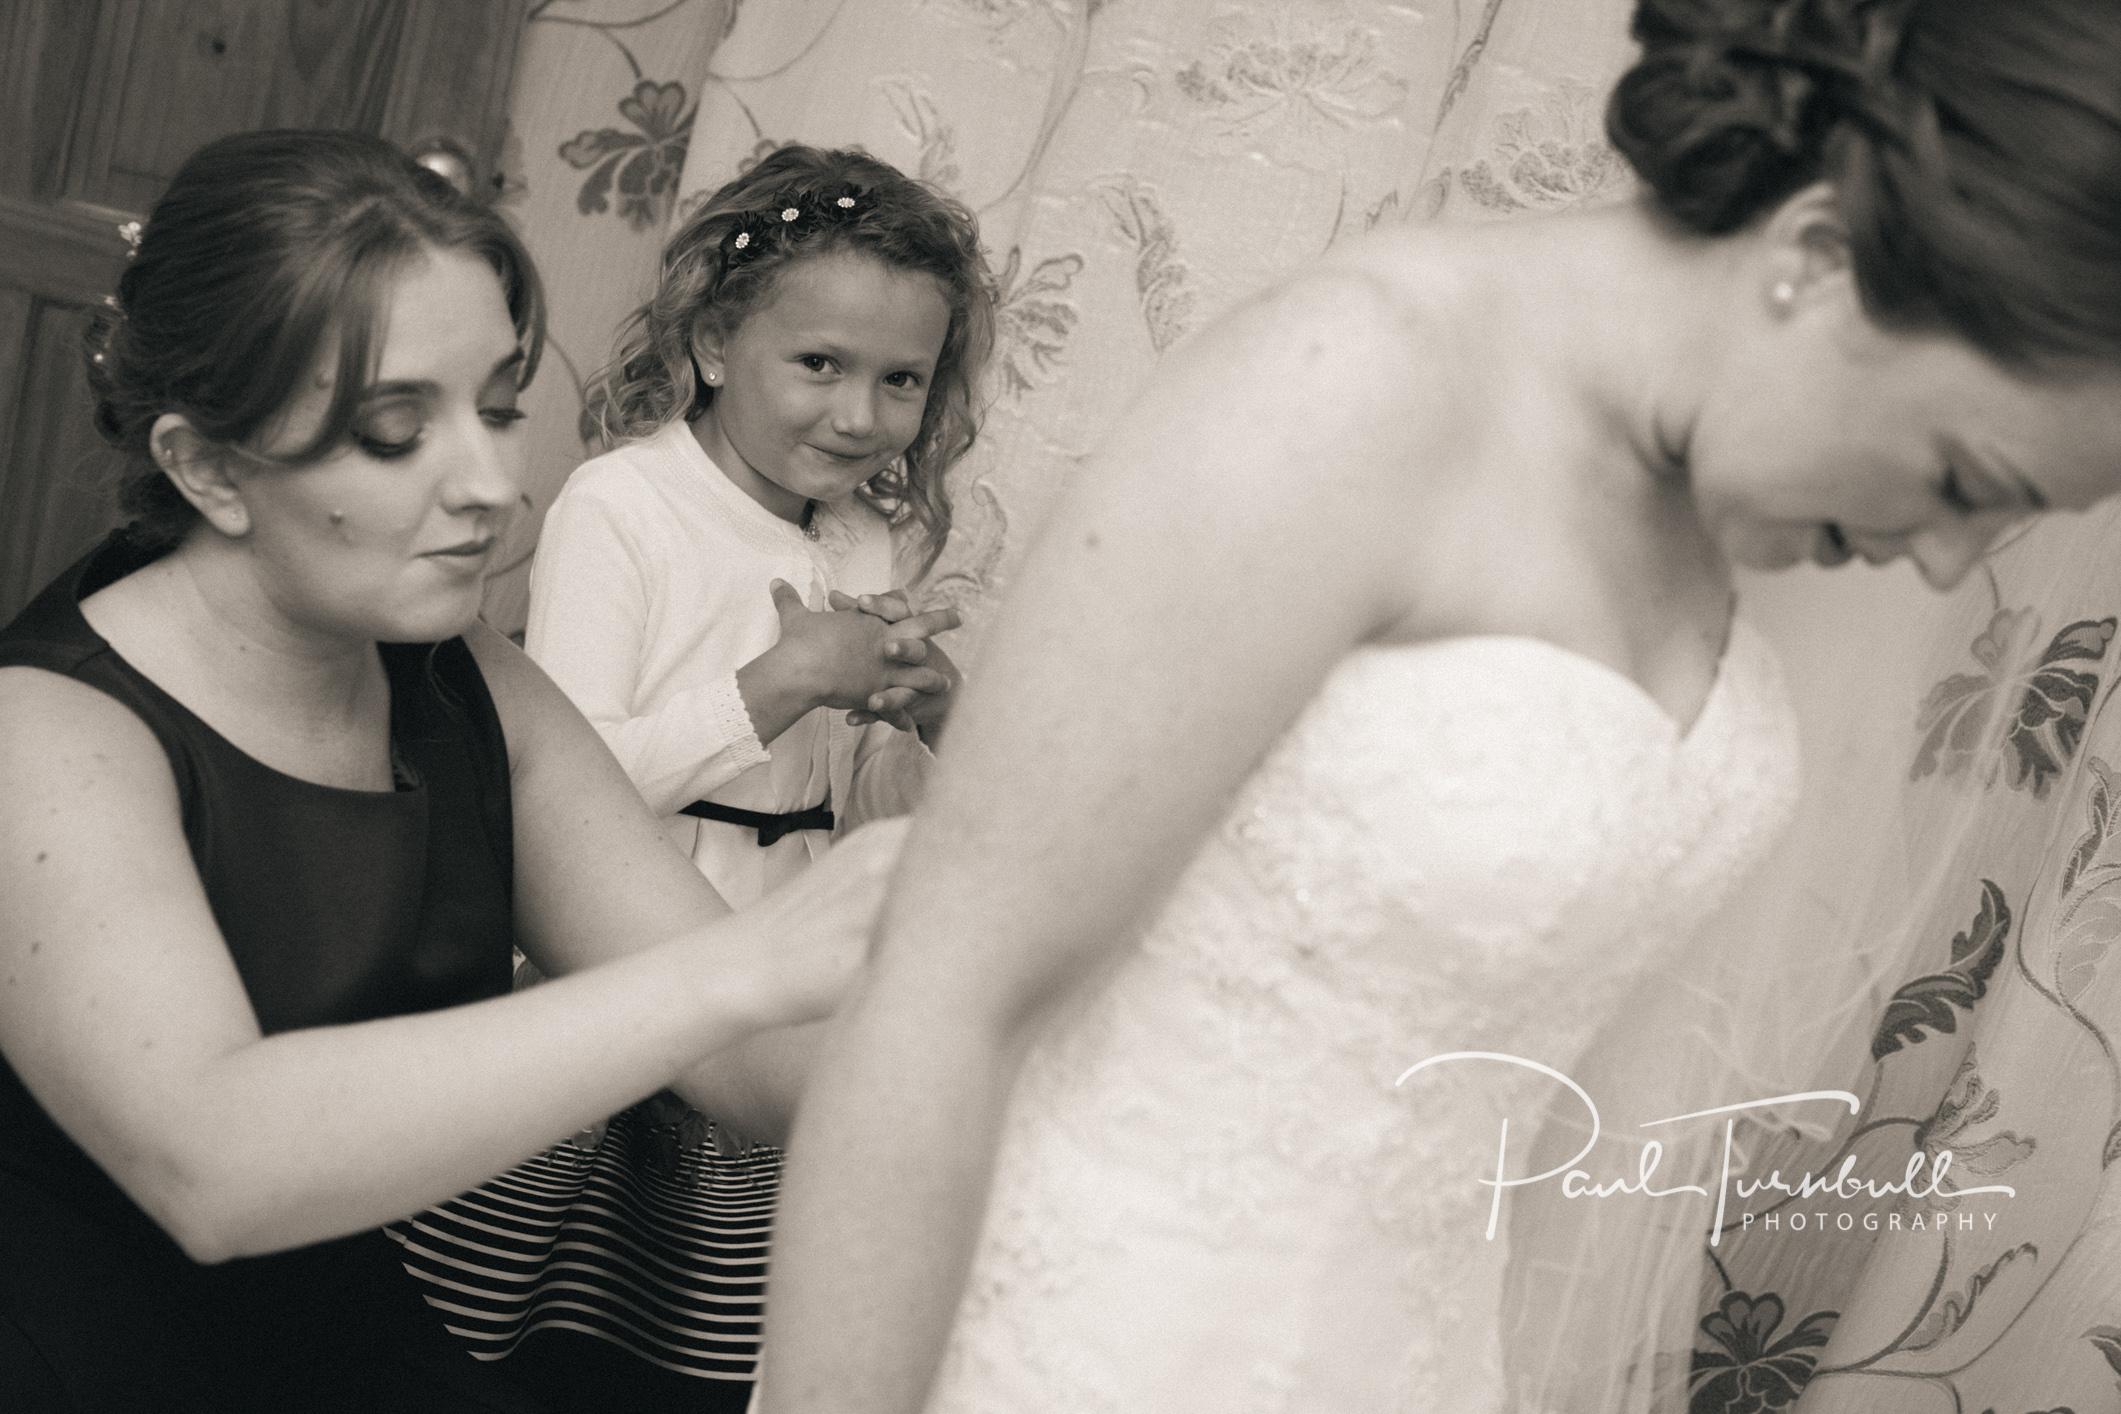 wedding-photographer-south-dalton-walkington-yorkshire-emma-james-015.jpg